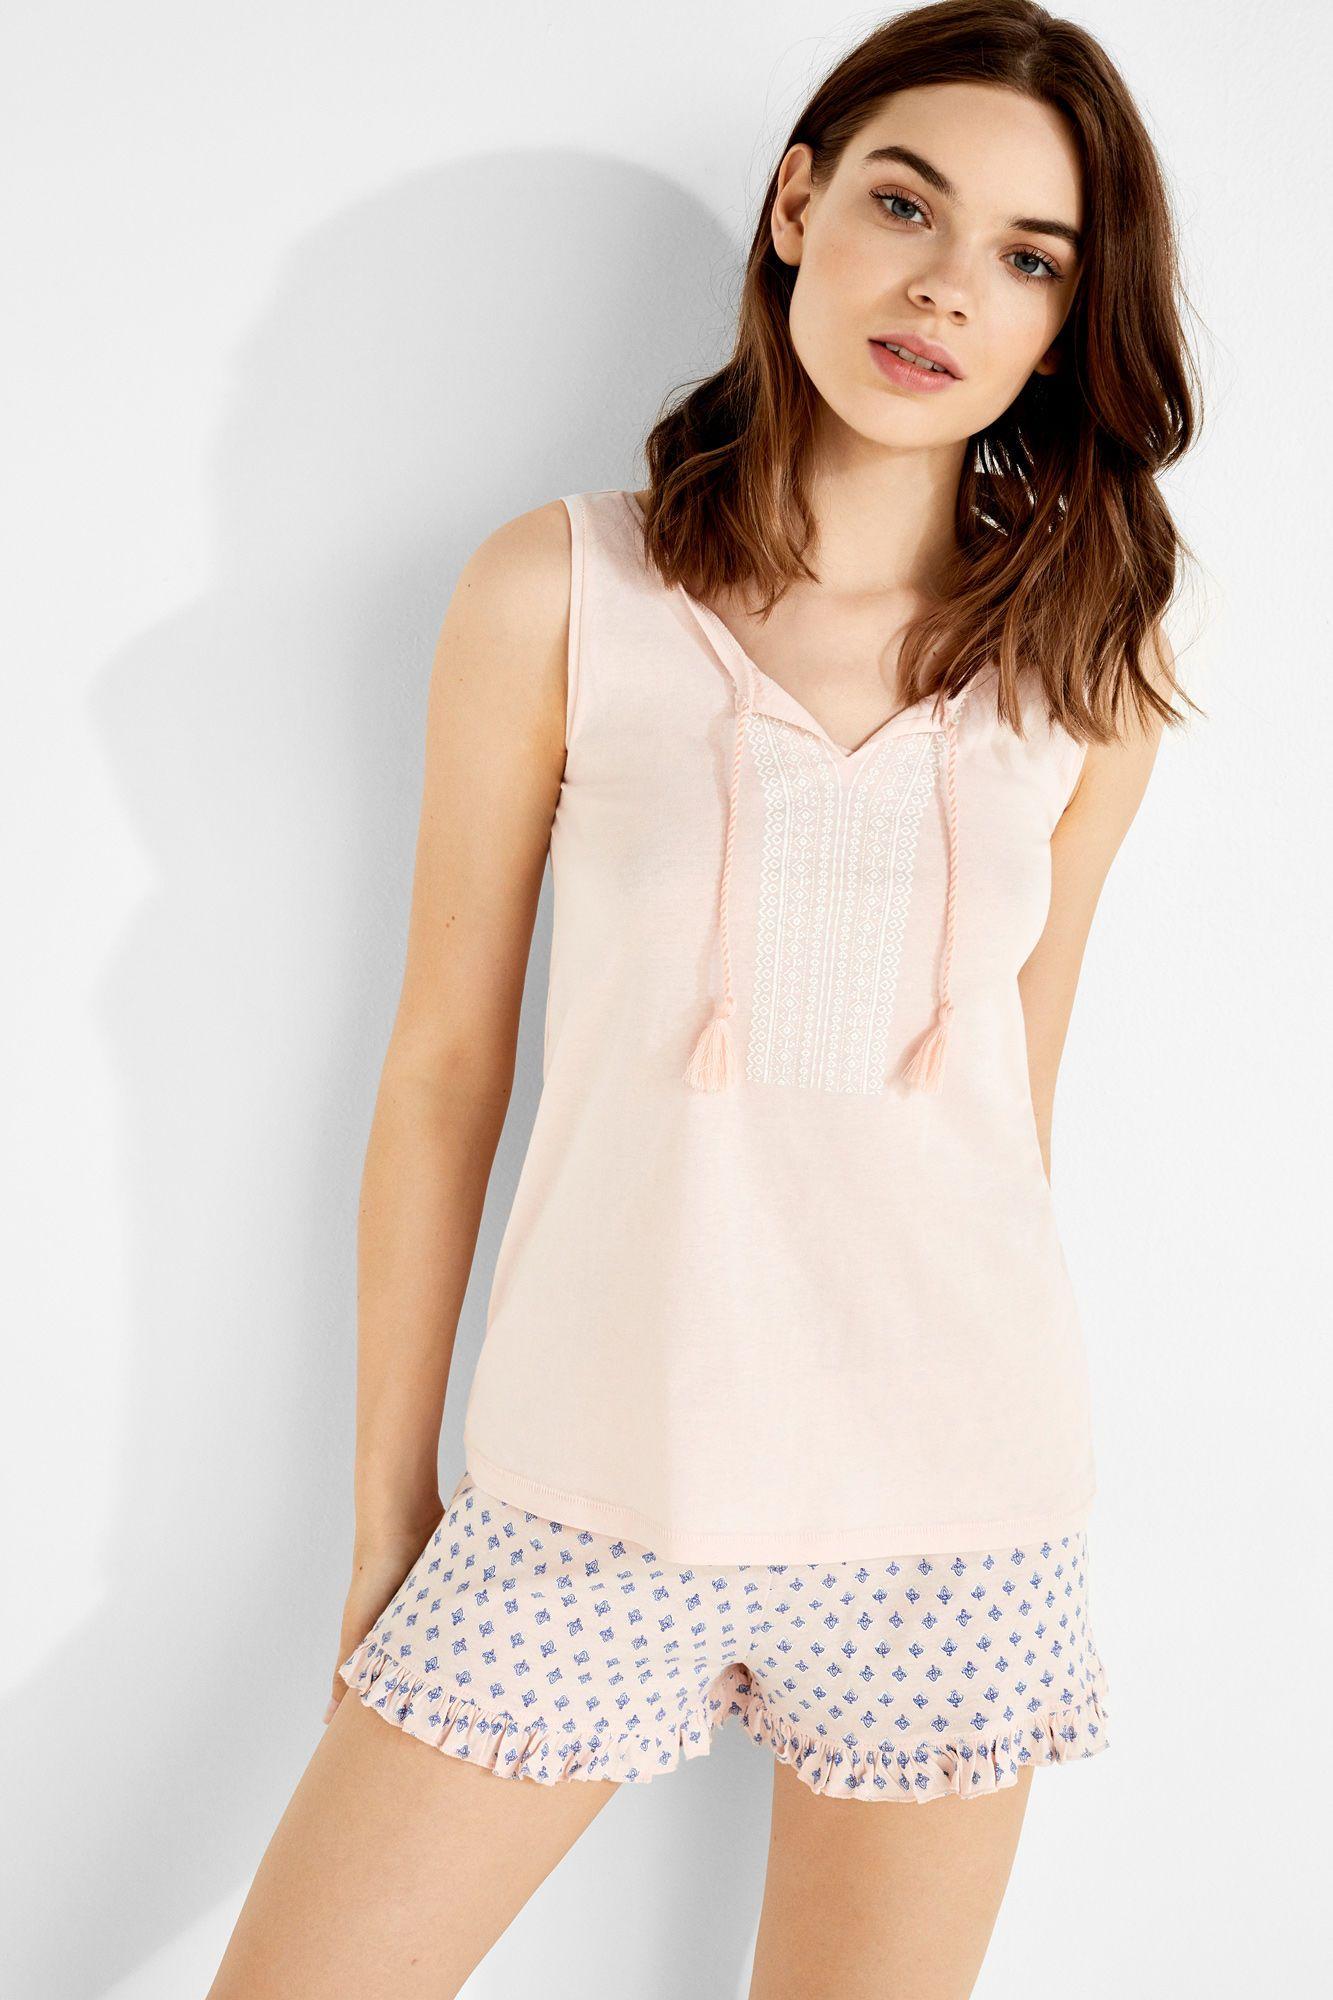 d6e59974f9 Womensecret Pijama corto de algodón estampado rosa